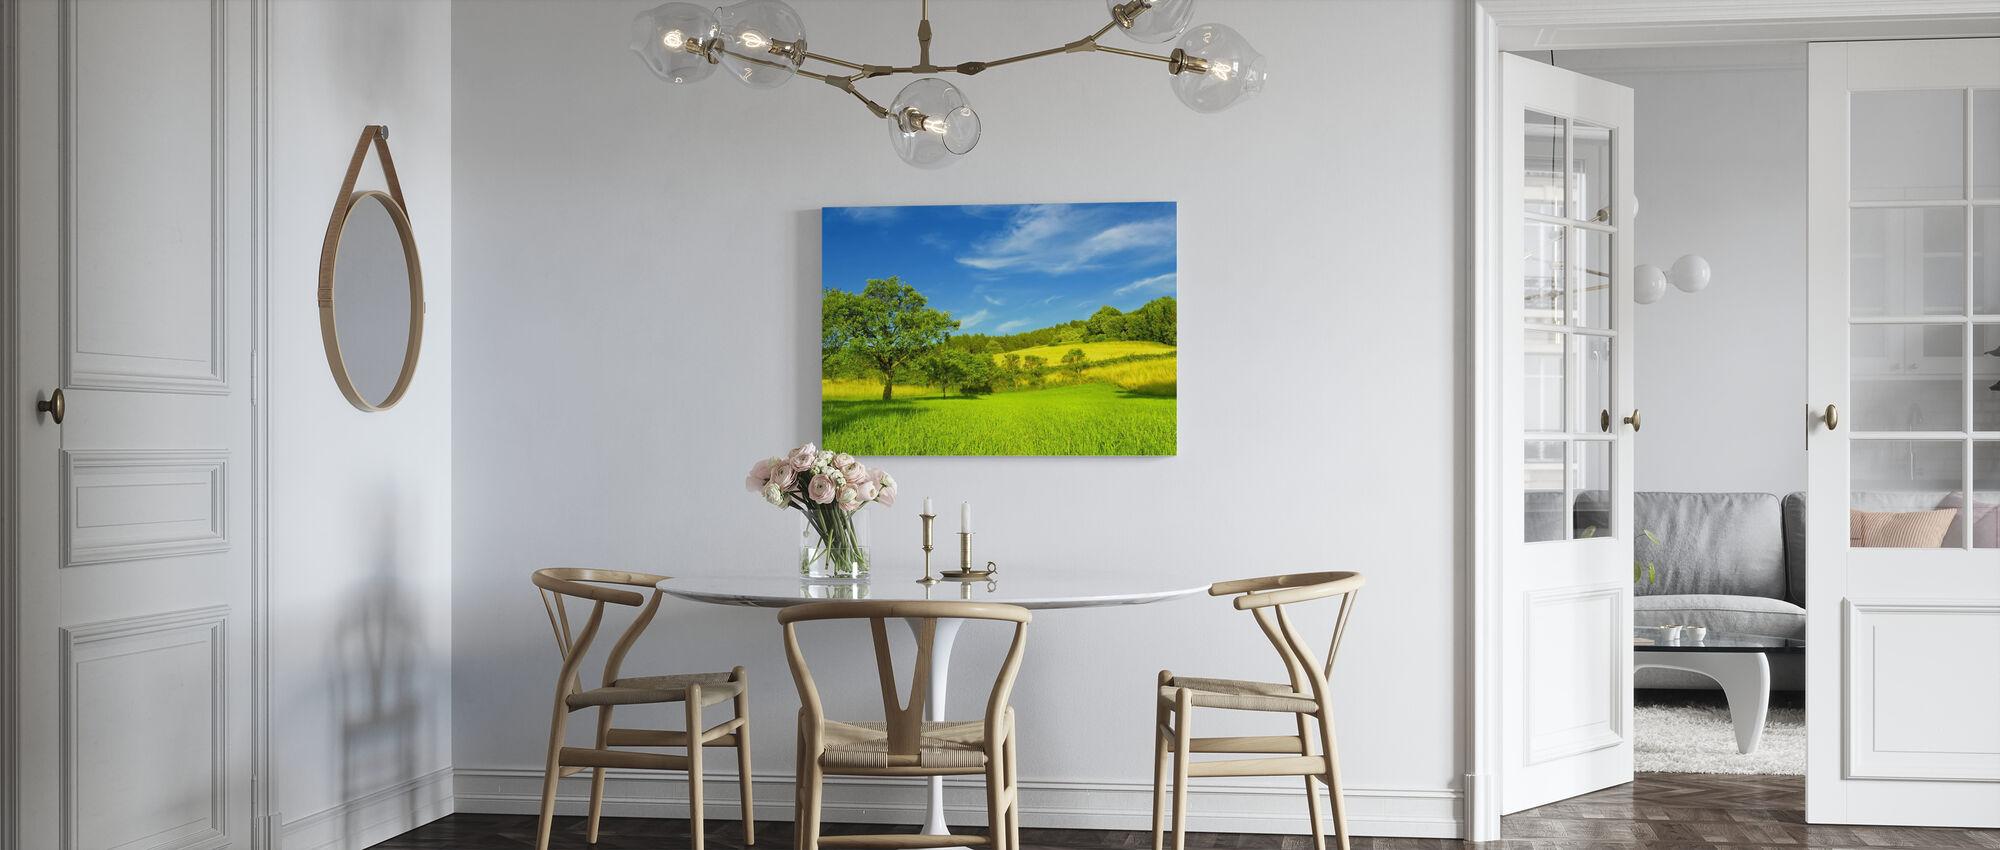 Sunny Summer Day - Canvas print - Kitchen